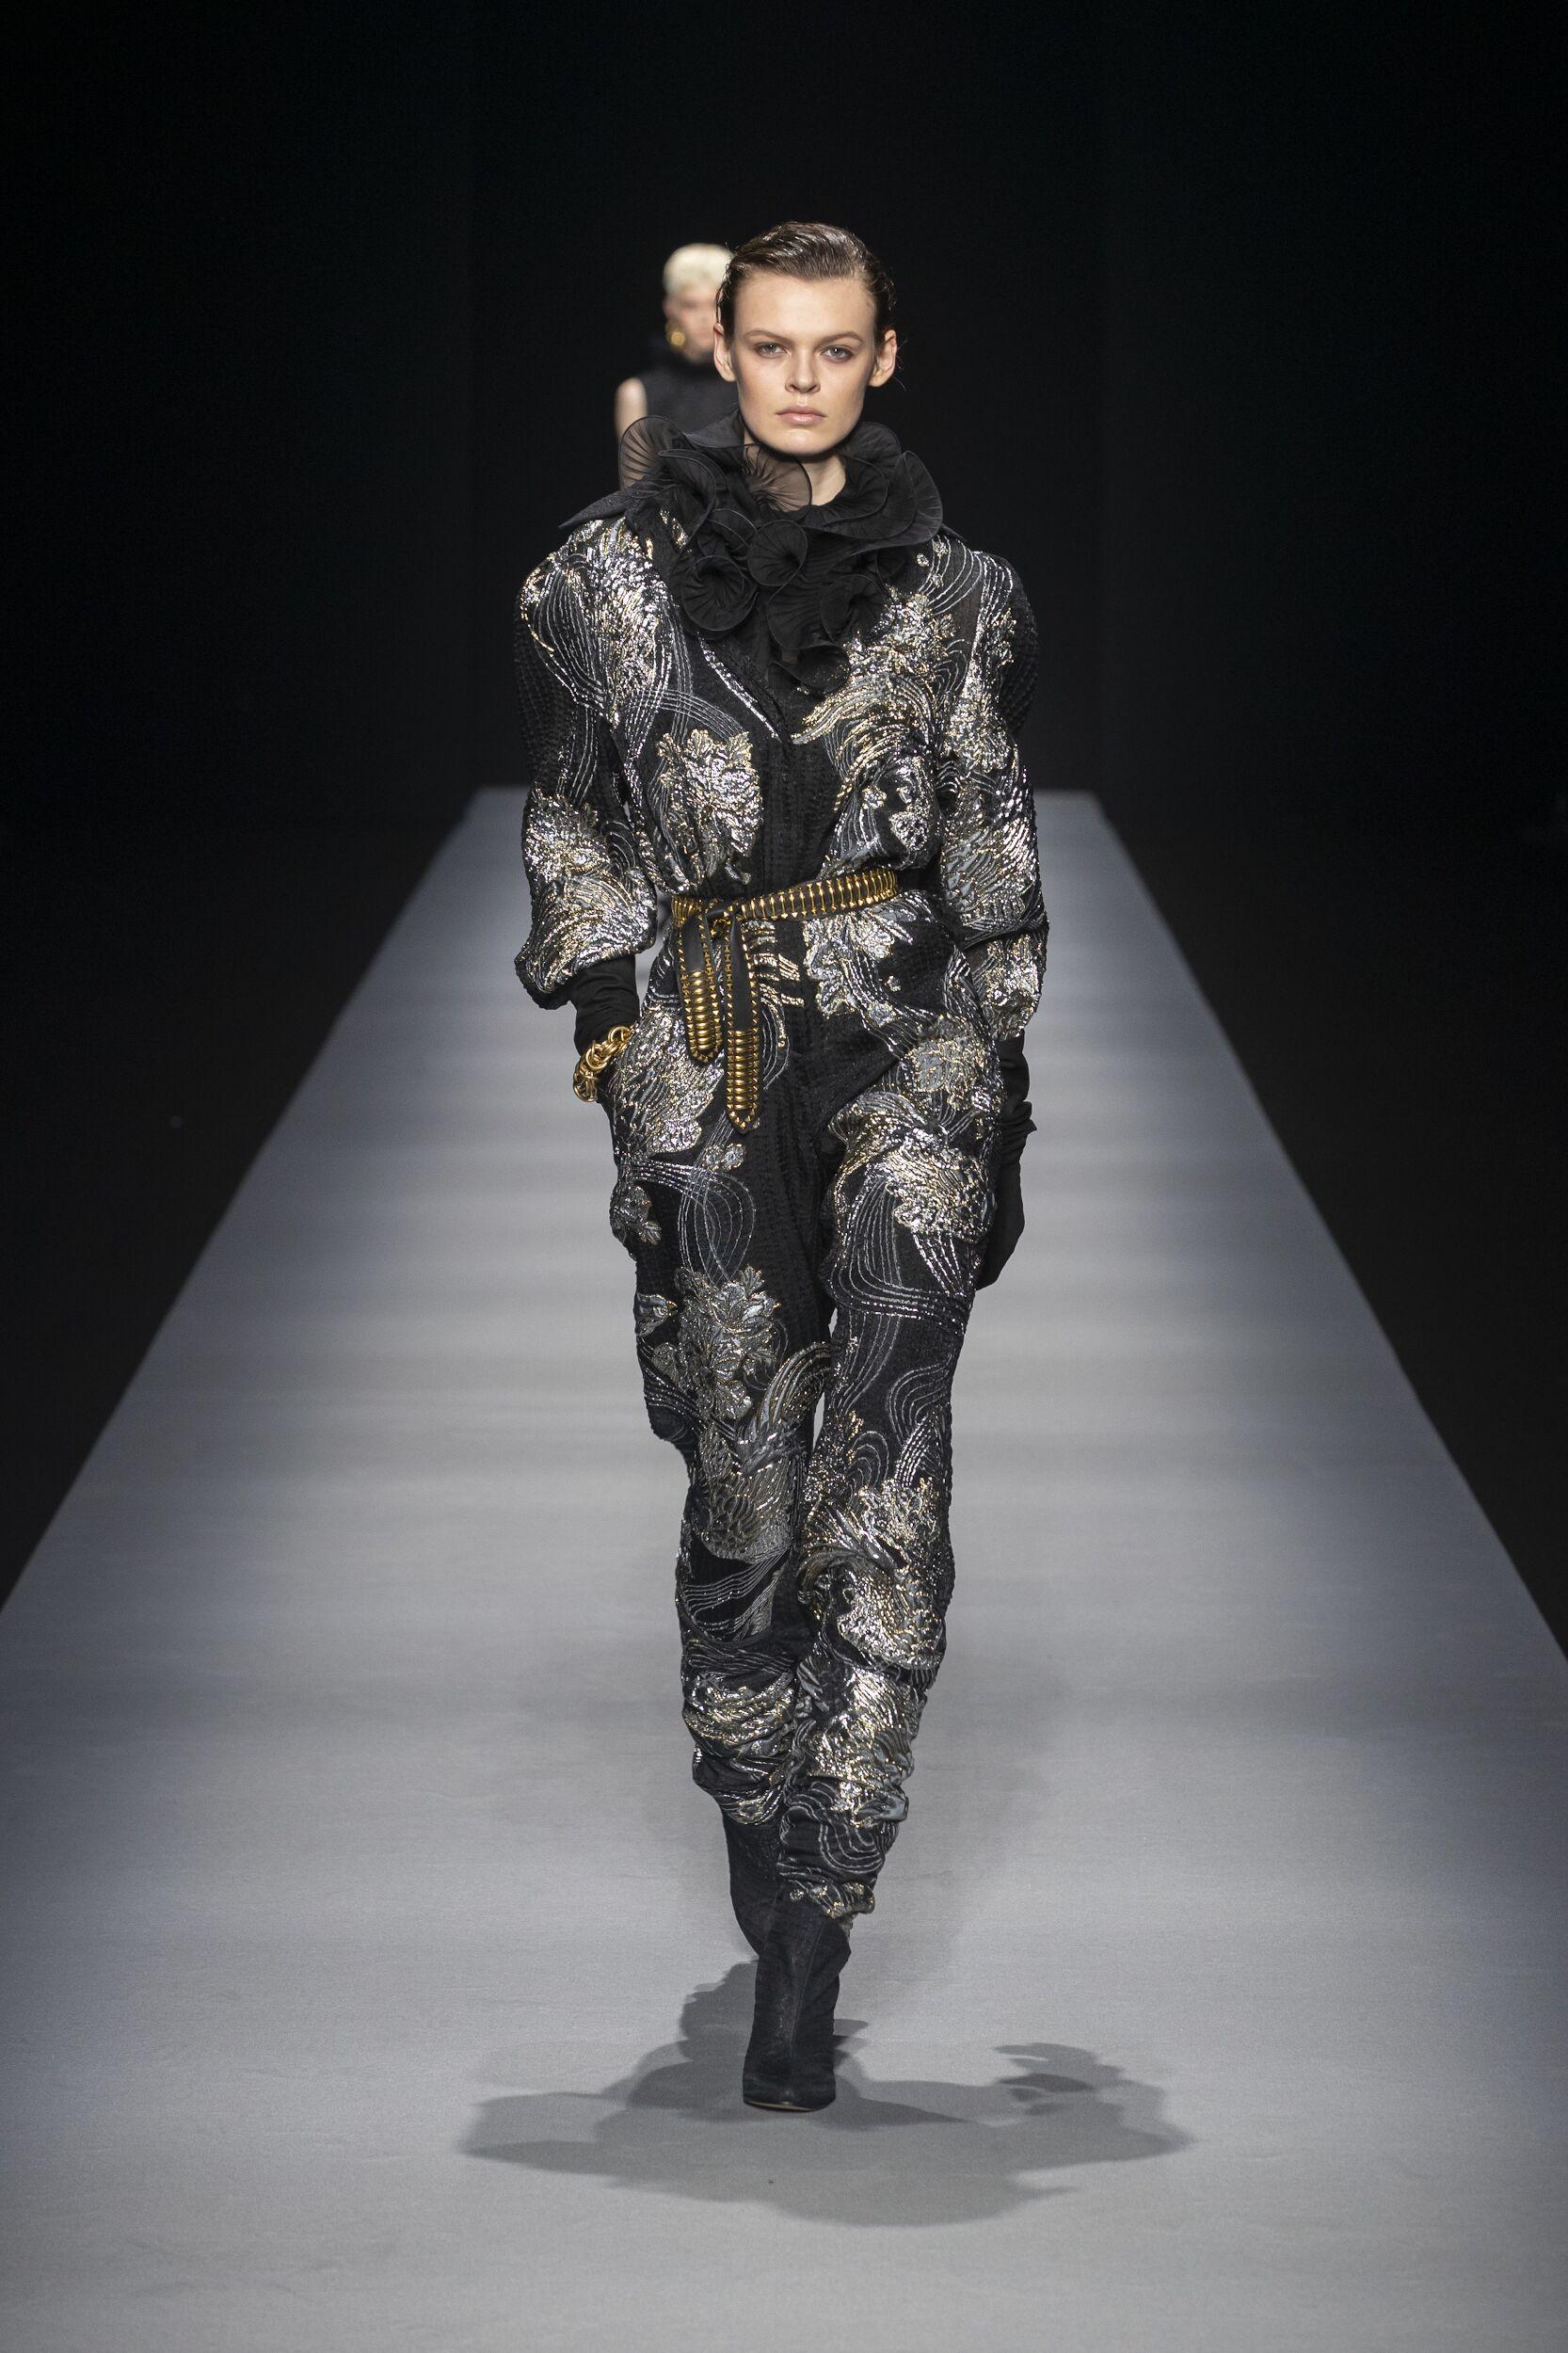 Catwalk Alberta Ferretti Woman Fashion Show Winter 2020